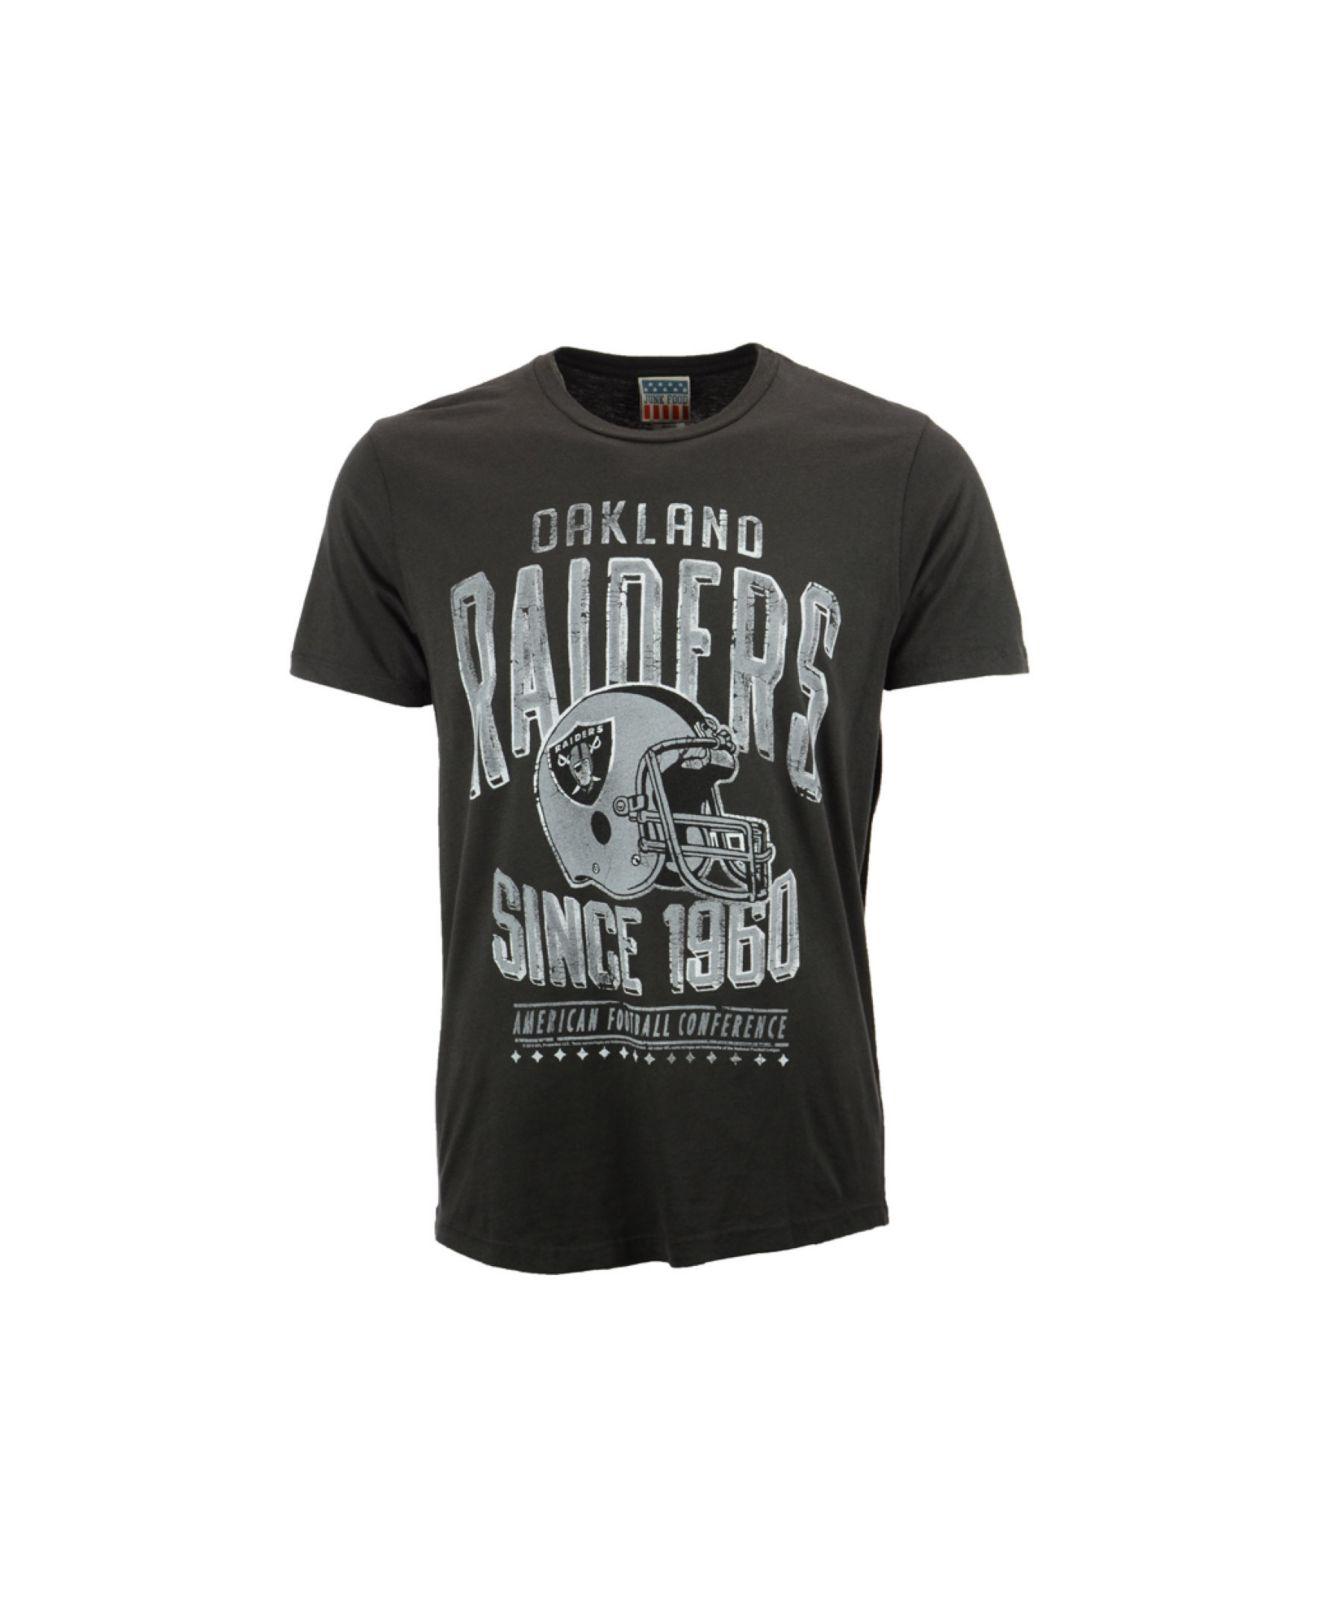 0e5ce3fec155 Lyst - Junk Food Men's Oakland Raiders Graphic T-shirt in Black for Men